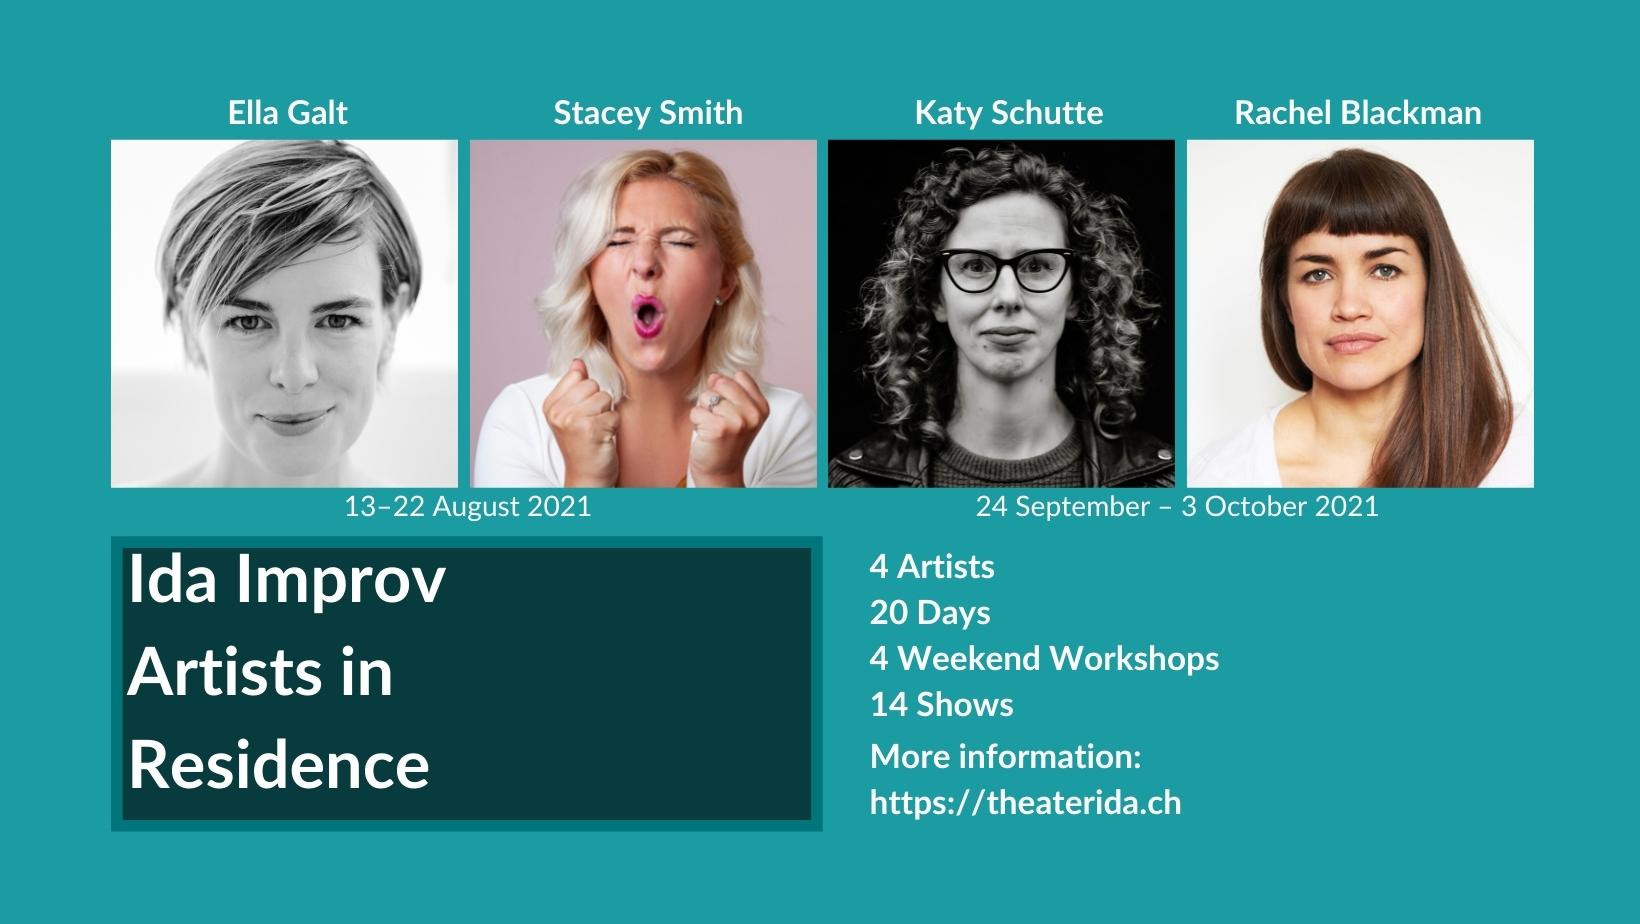 Ida Improv Artists in Residenc